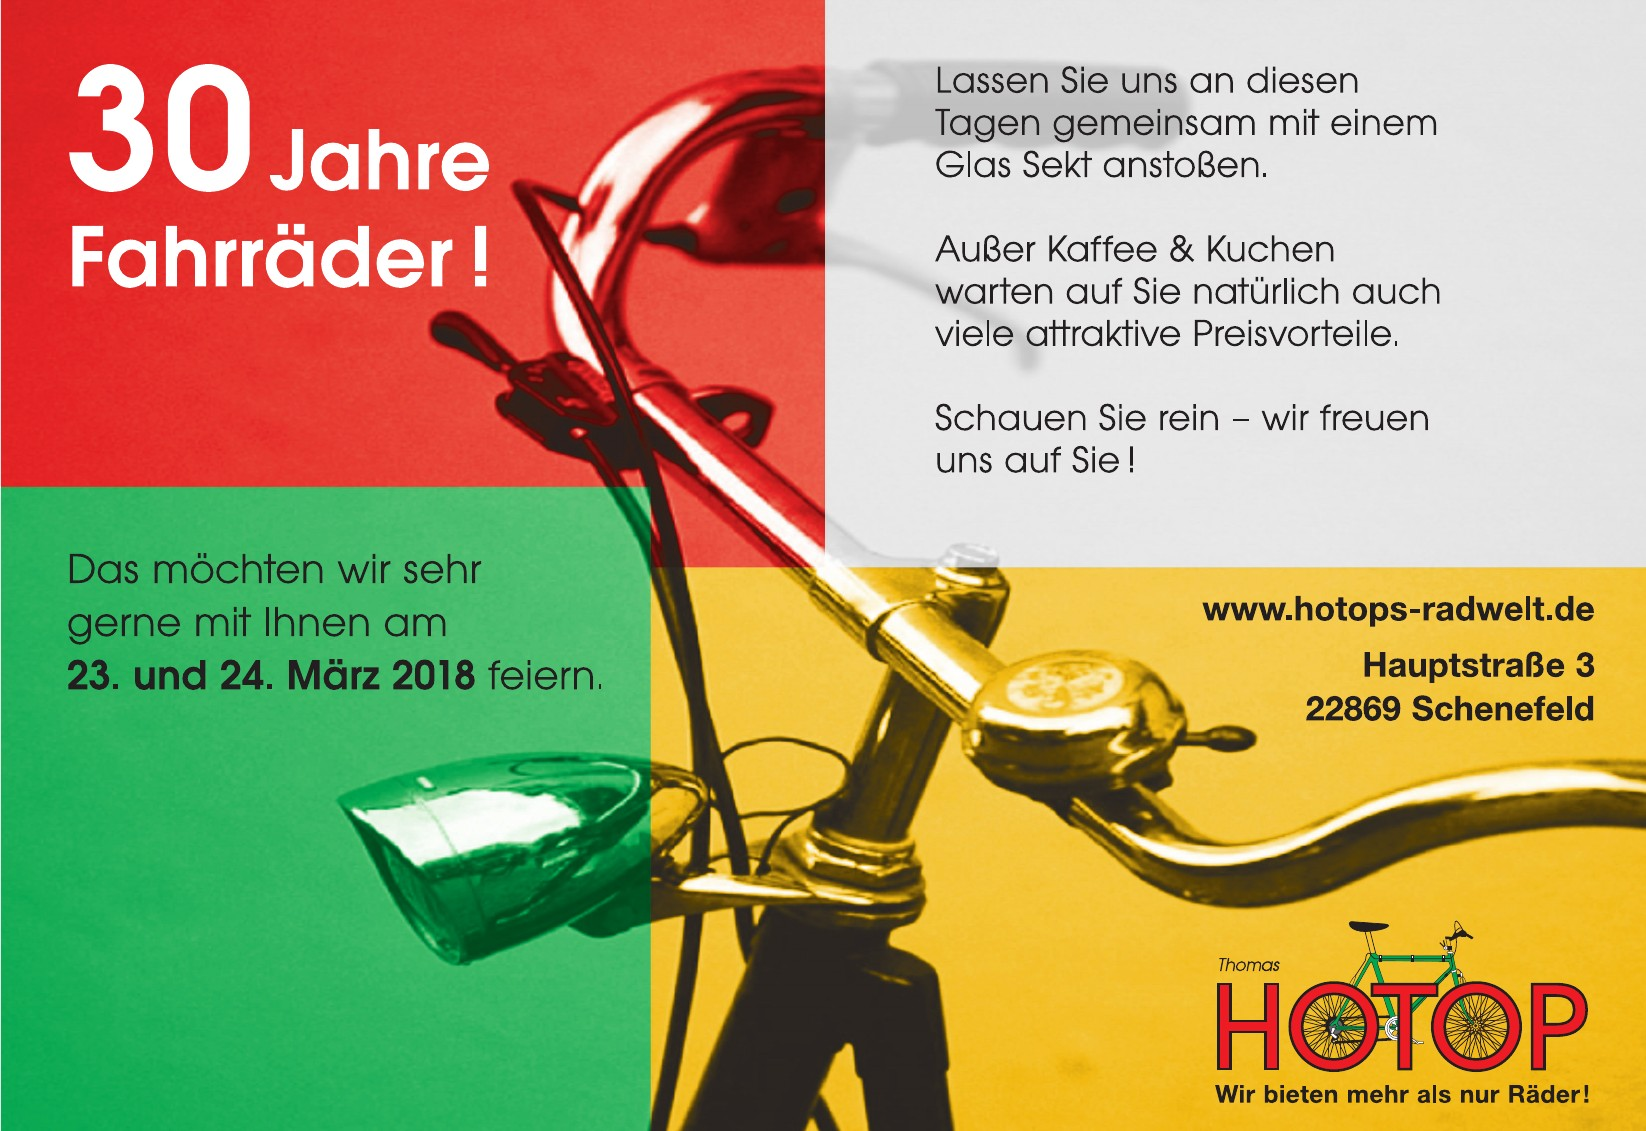 Hotop's Radwelt GmbH